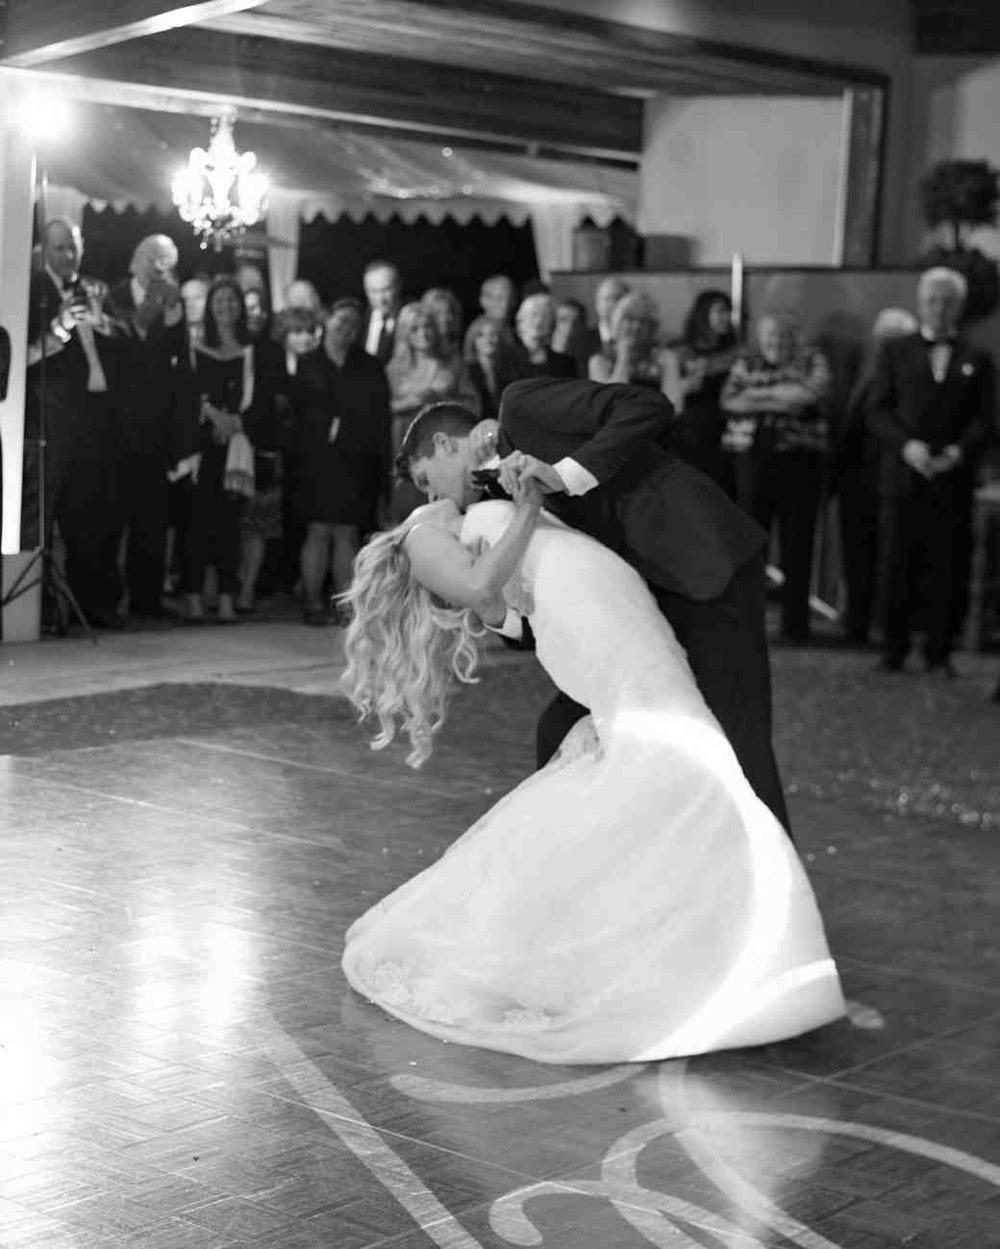 shannon-jon-wedding-firstdance-0875-6238579-0117_vert.jpg